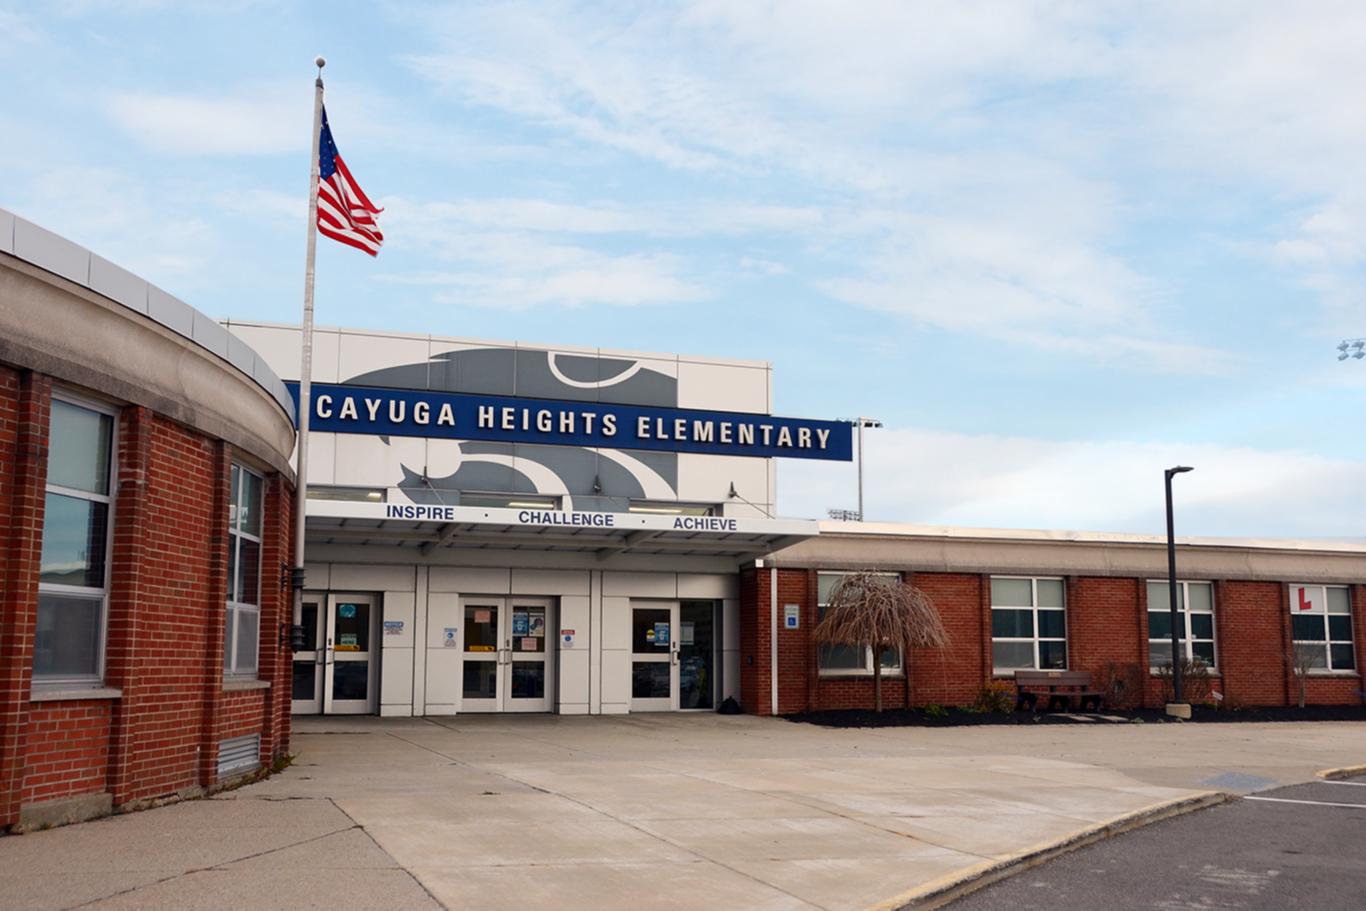 Cayuga Heights Elementary